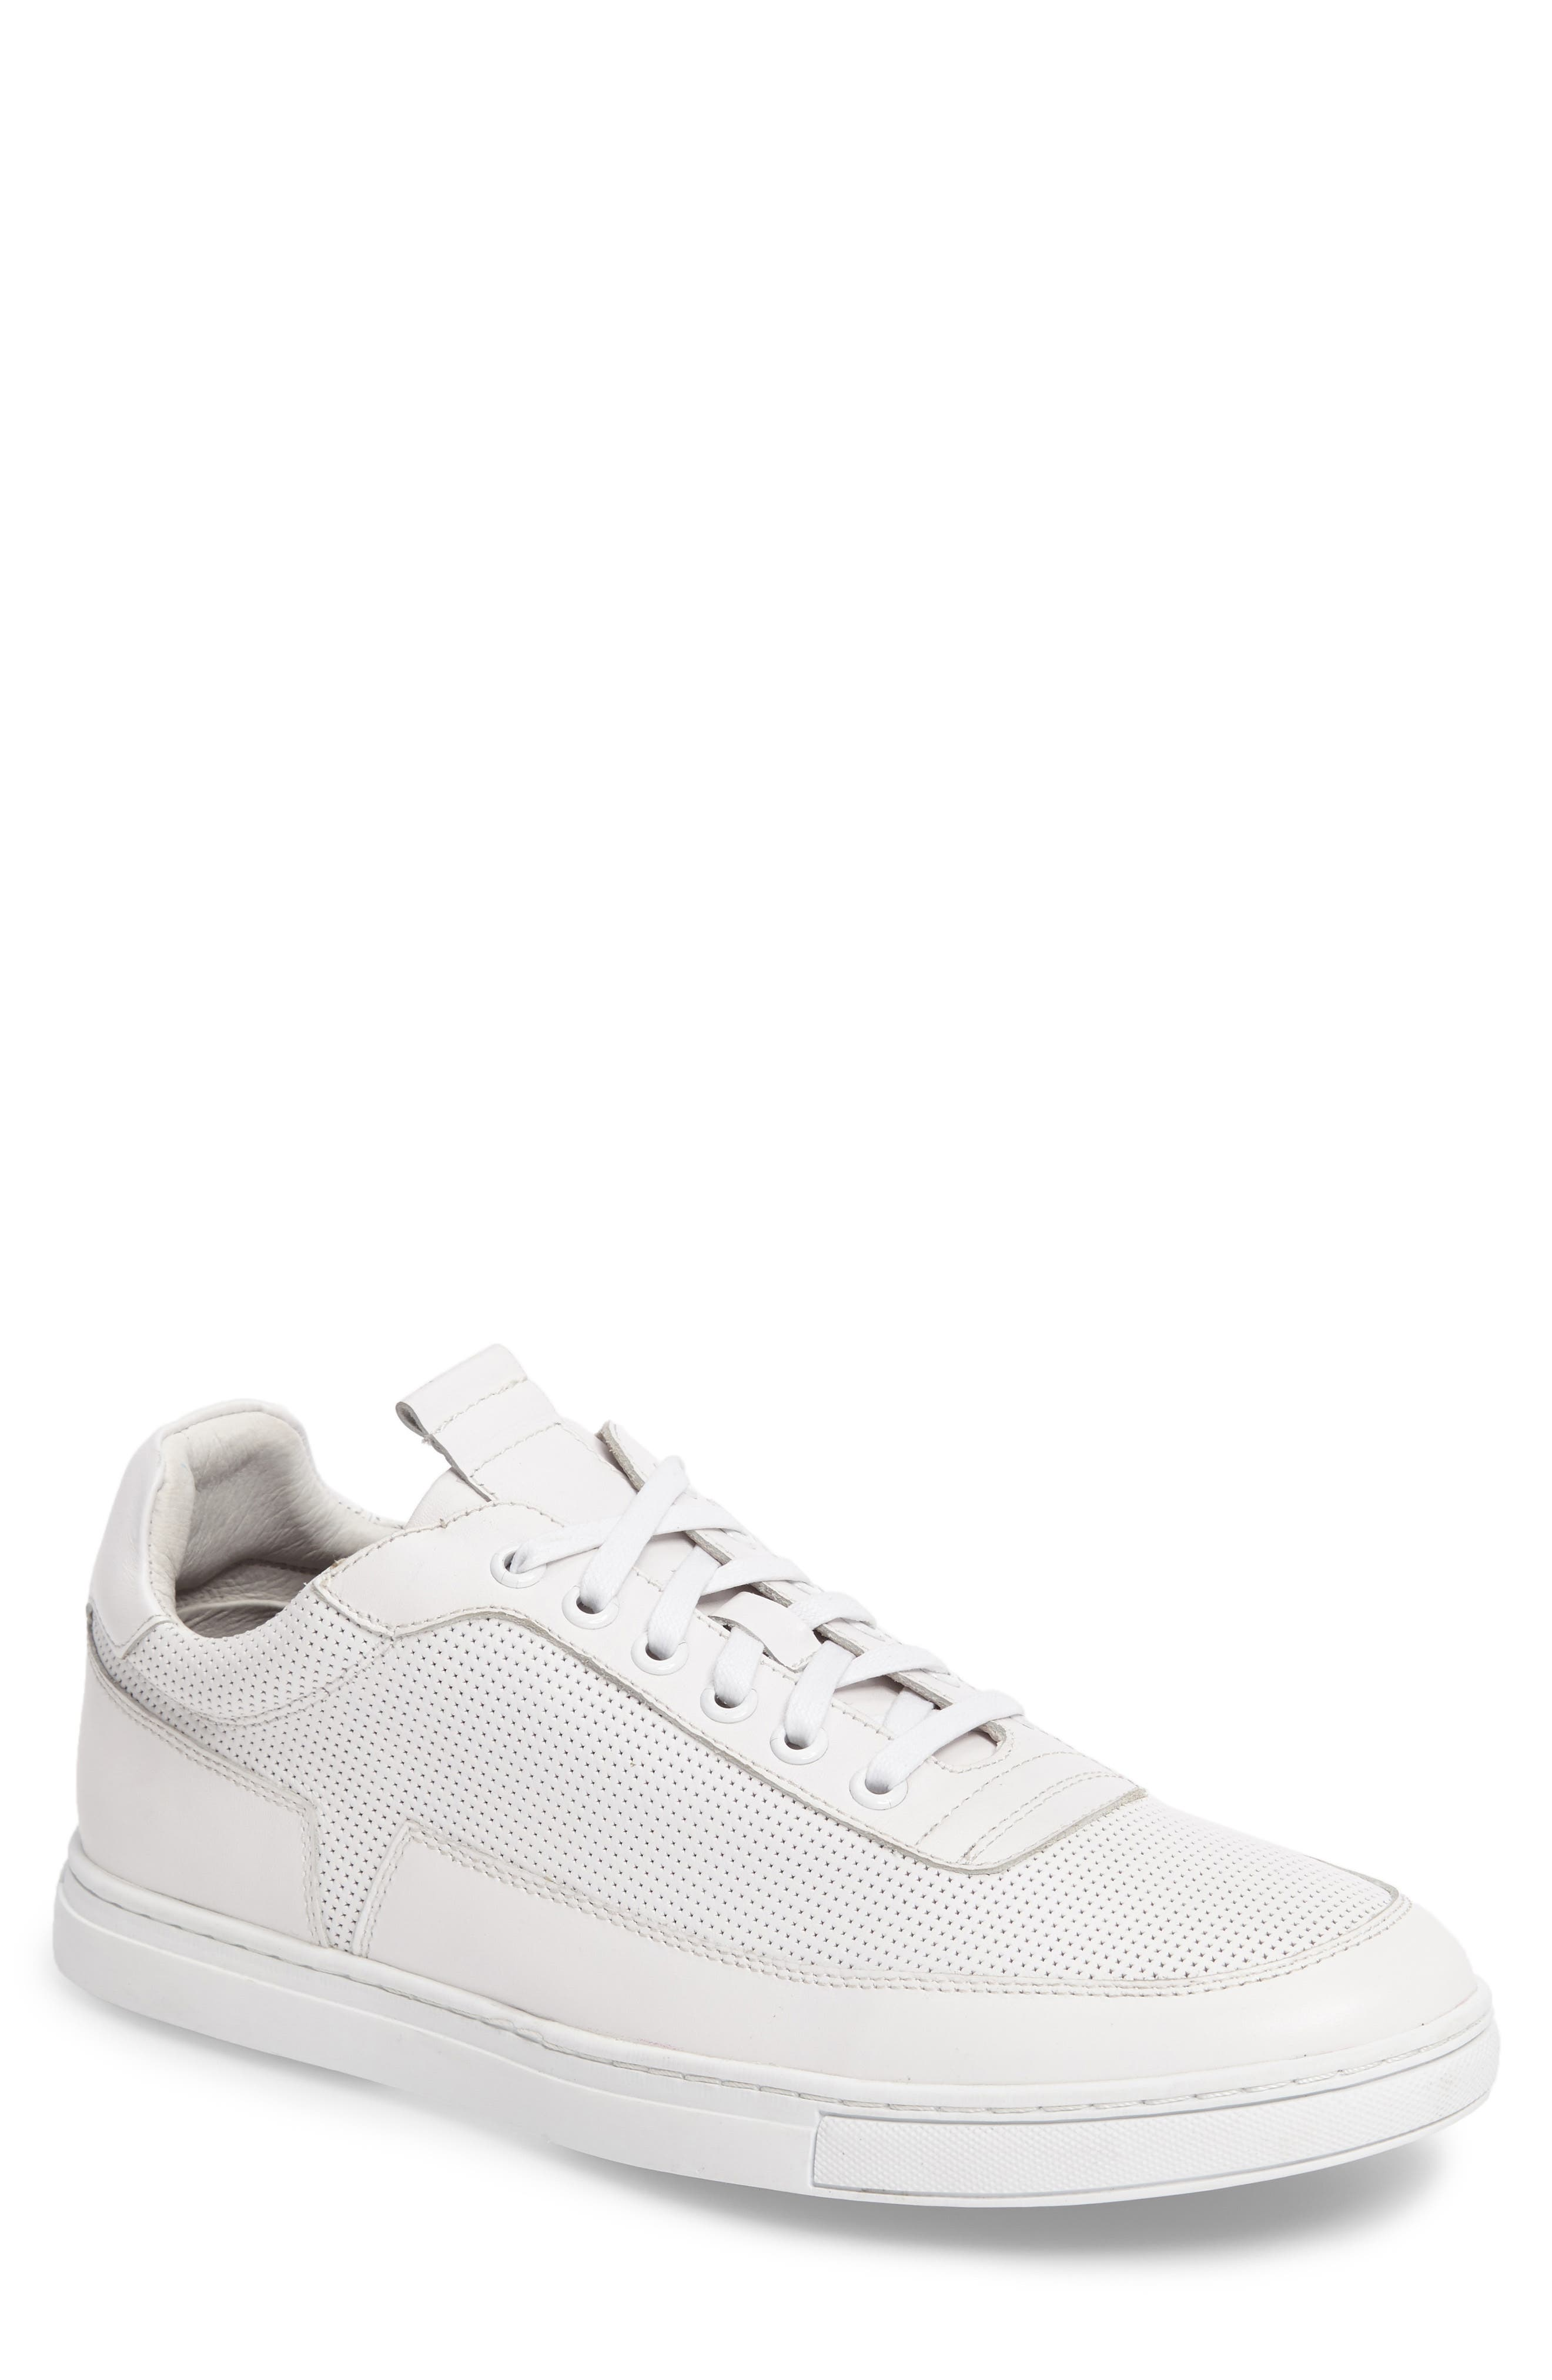 Main Image - Zanzara Harmony Sneaker (Men)